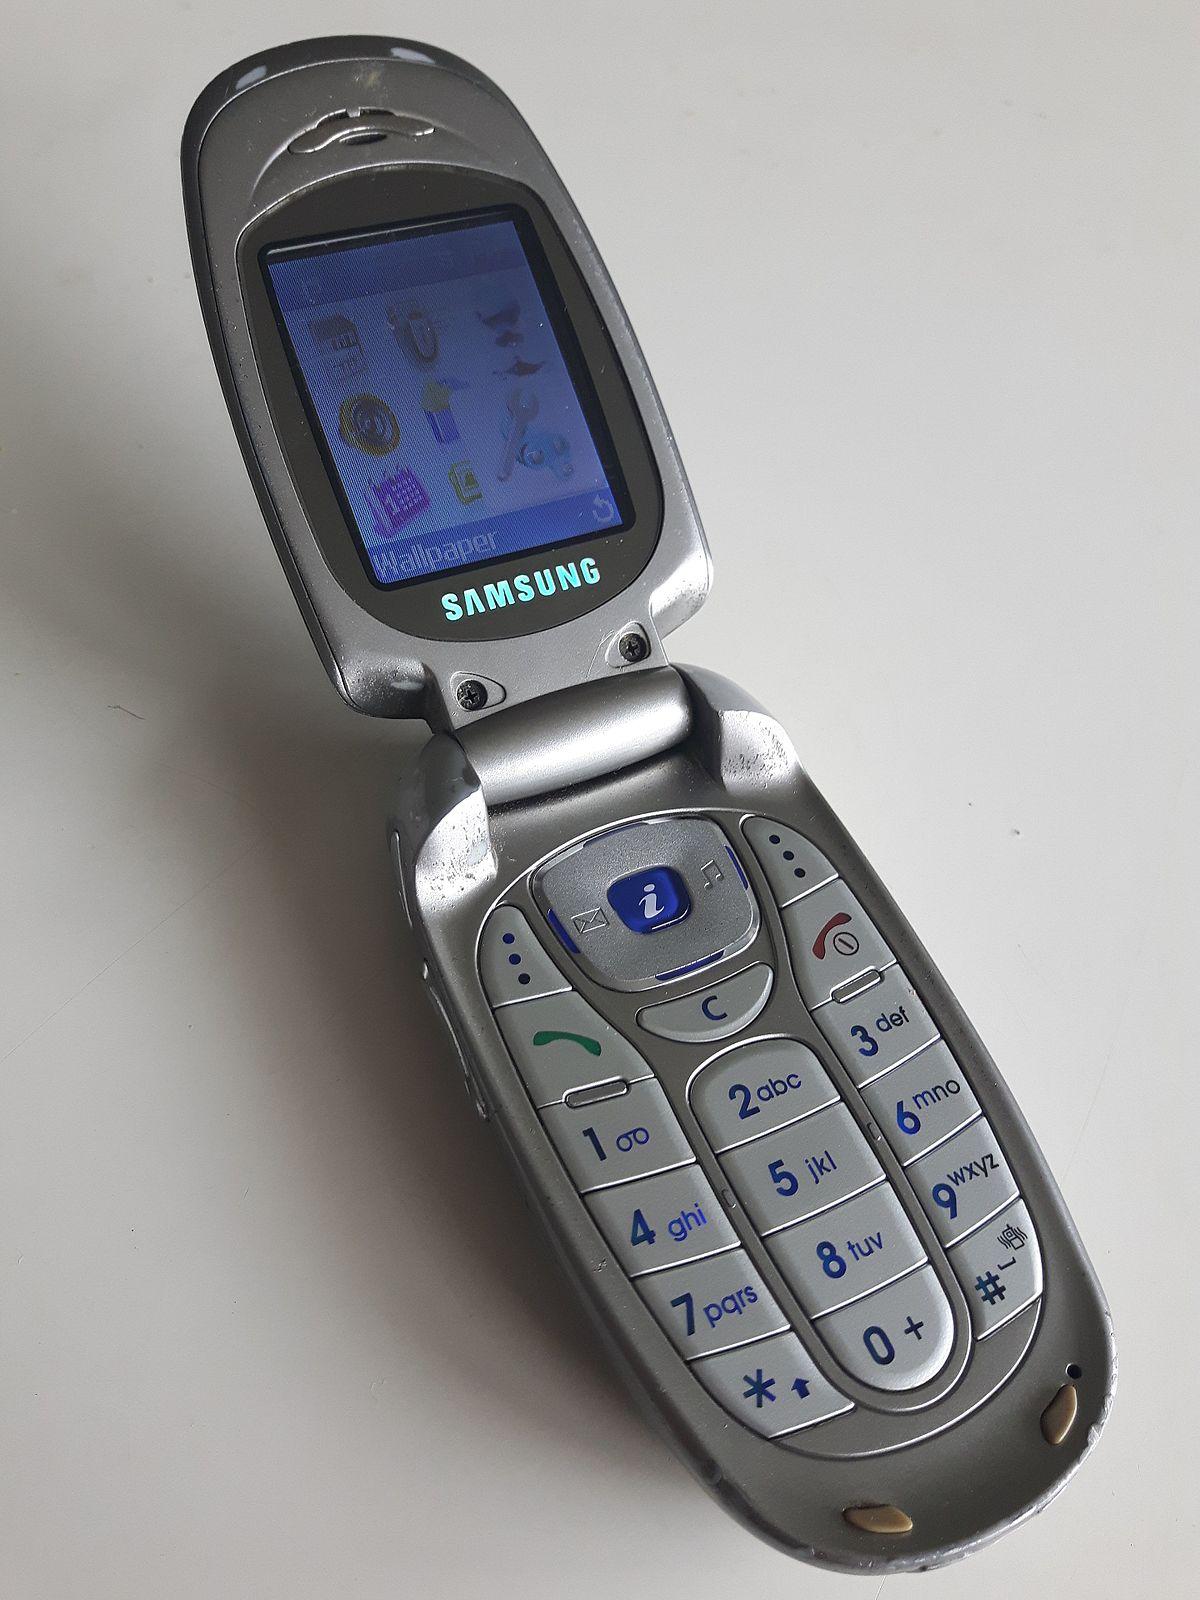 Samsung SGH-X480 - Wikipedia